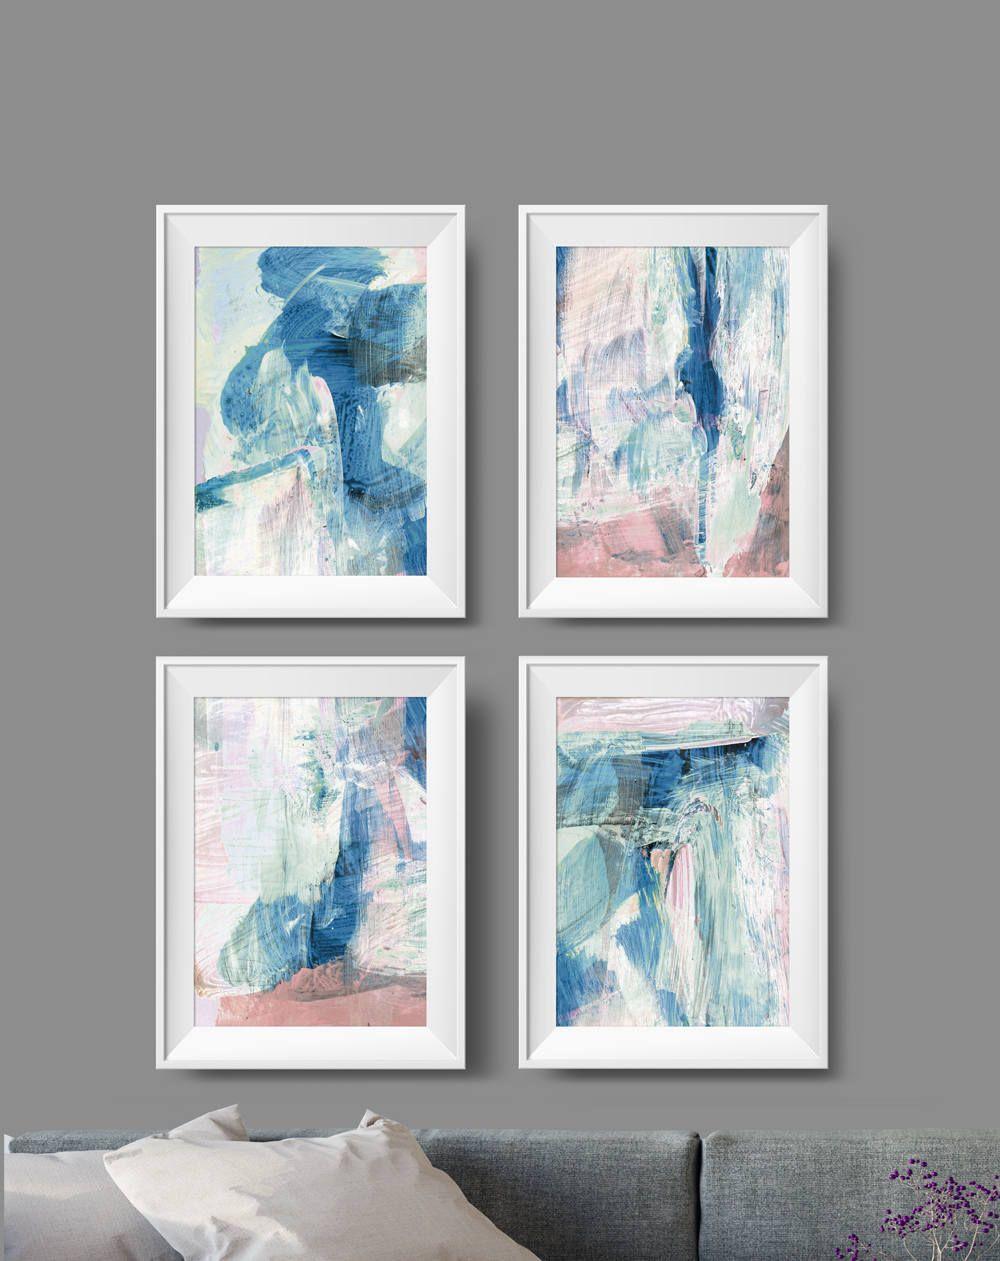 Large Wall Art Set of 4 Prints Instant download Art 11x14 Wall Art Bedroom Art Print Printable Abstract Art Abstract Art Prints